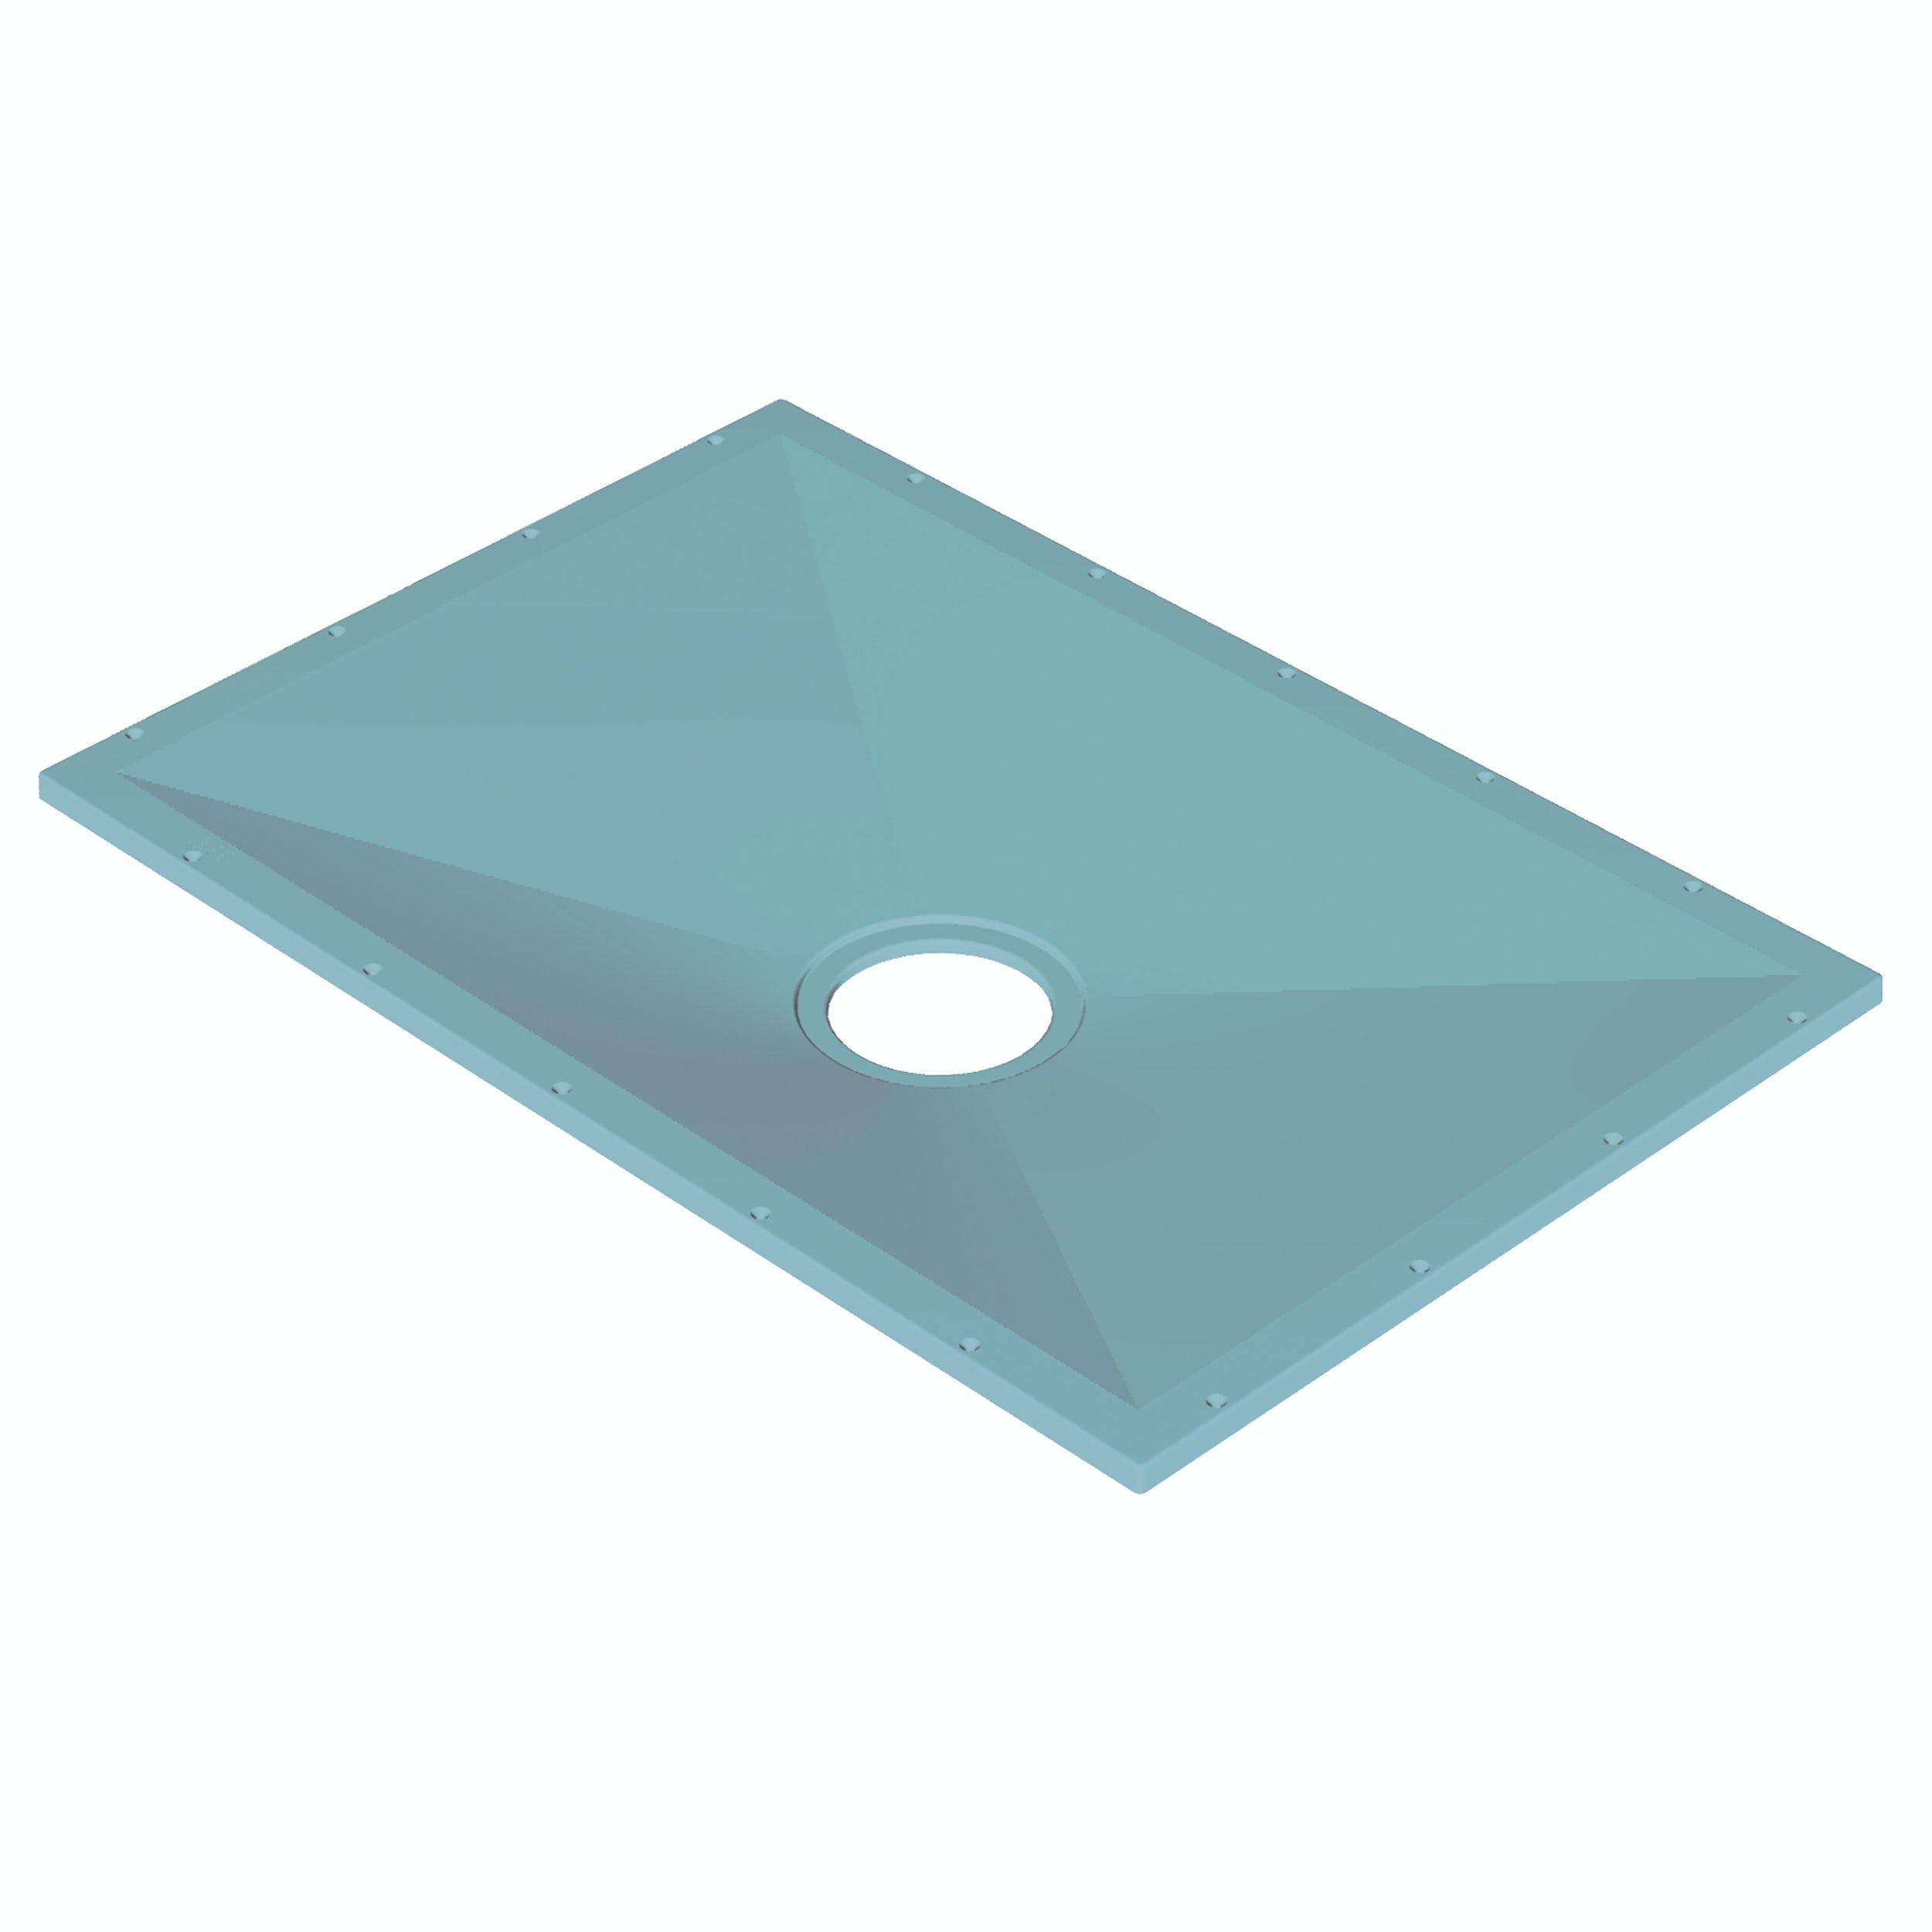 AKW Tuff Form rectangular wet room tray former